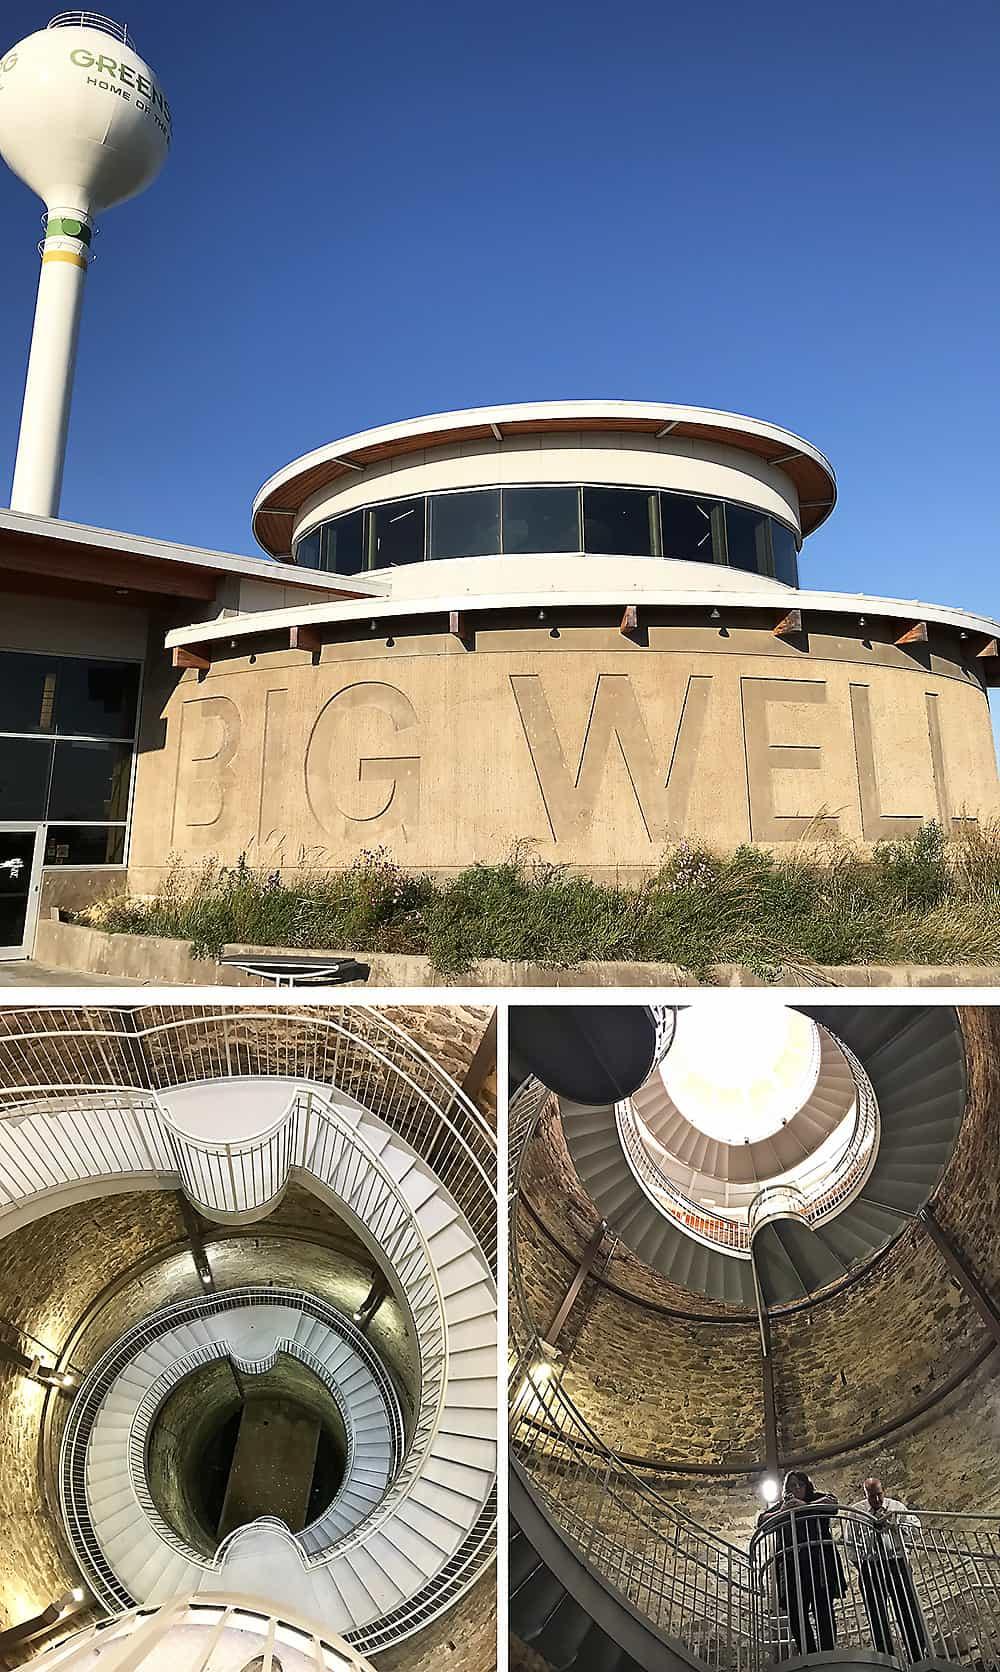 The Big Well, Kansas, Photo